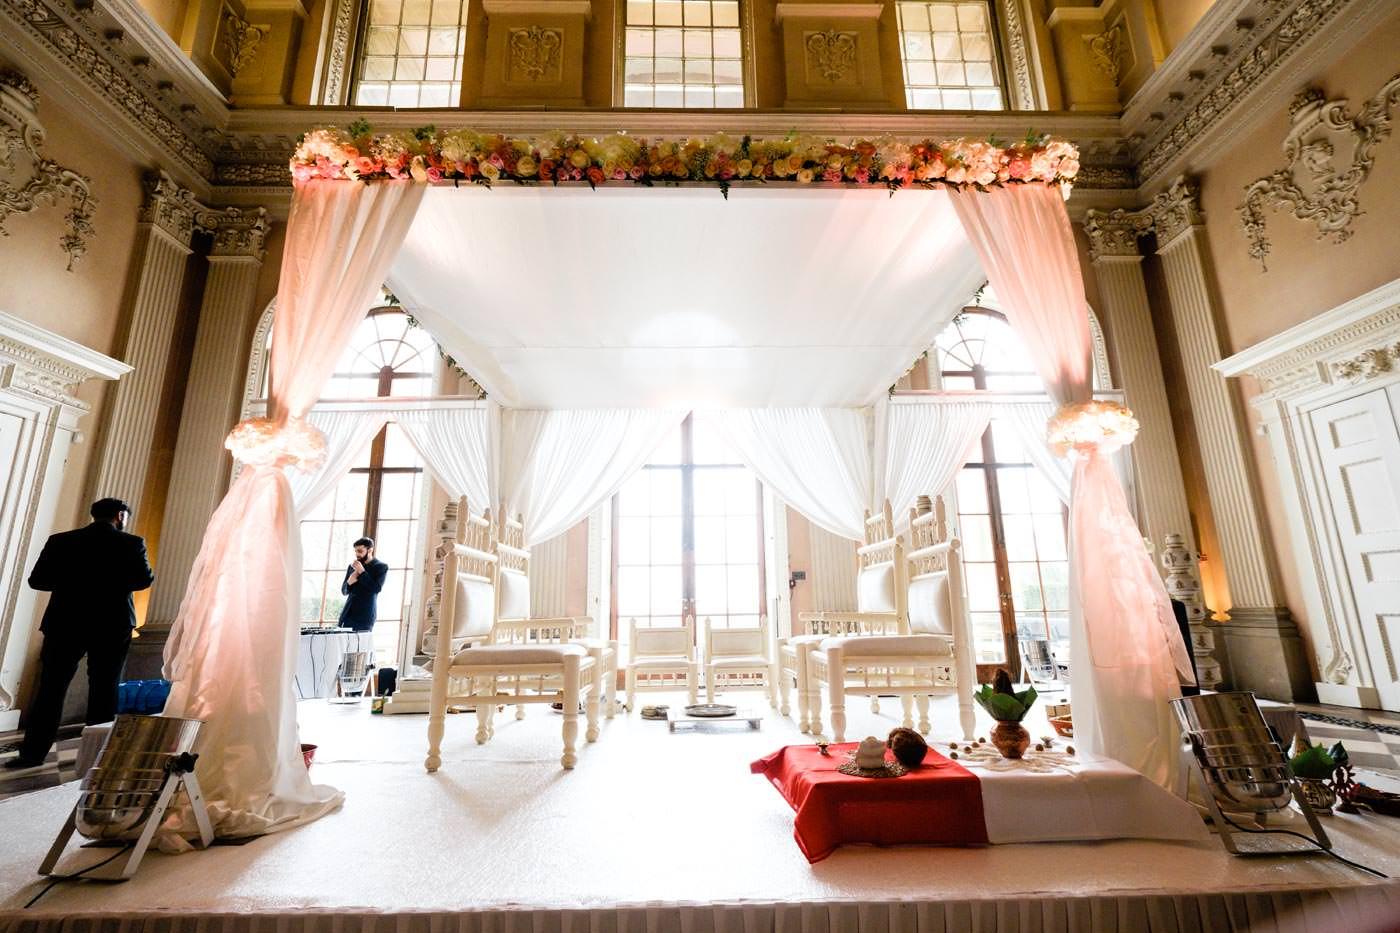 Great Hall at Ragley Hall prepared for Hindu wedding ceremony